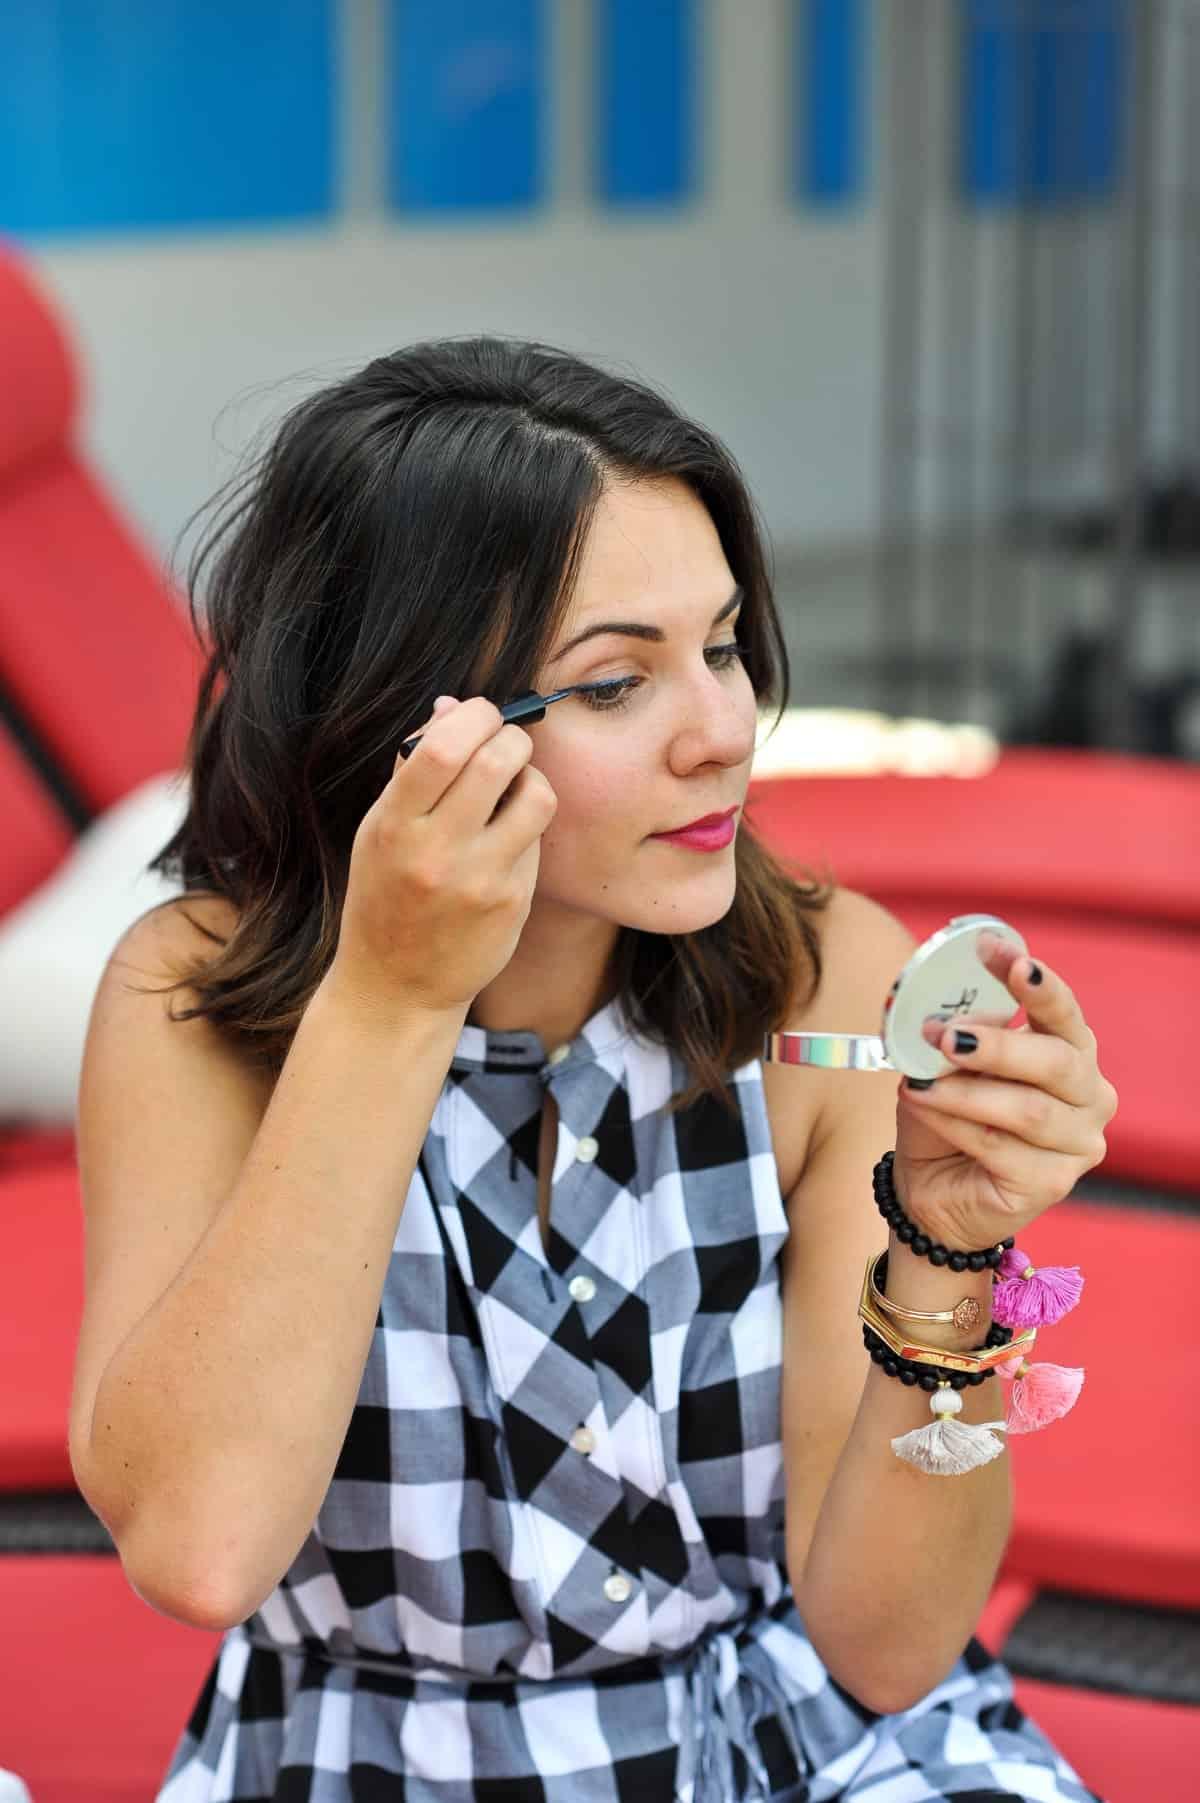 dolce & gabbana waterproof liquid eyeliner, summer beauty tips for hot summer days